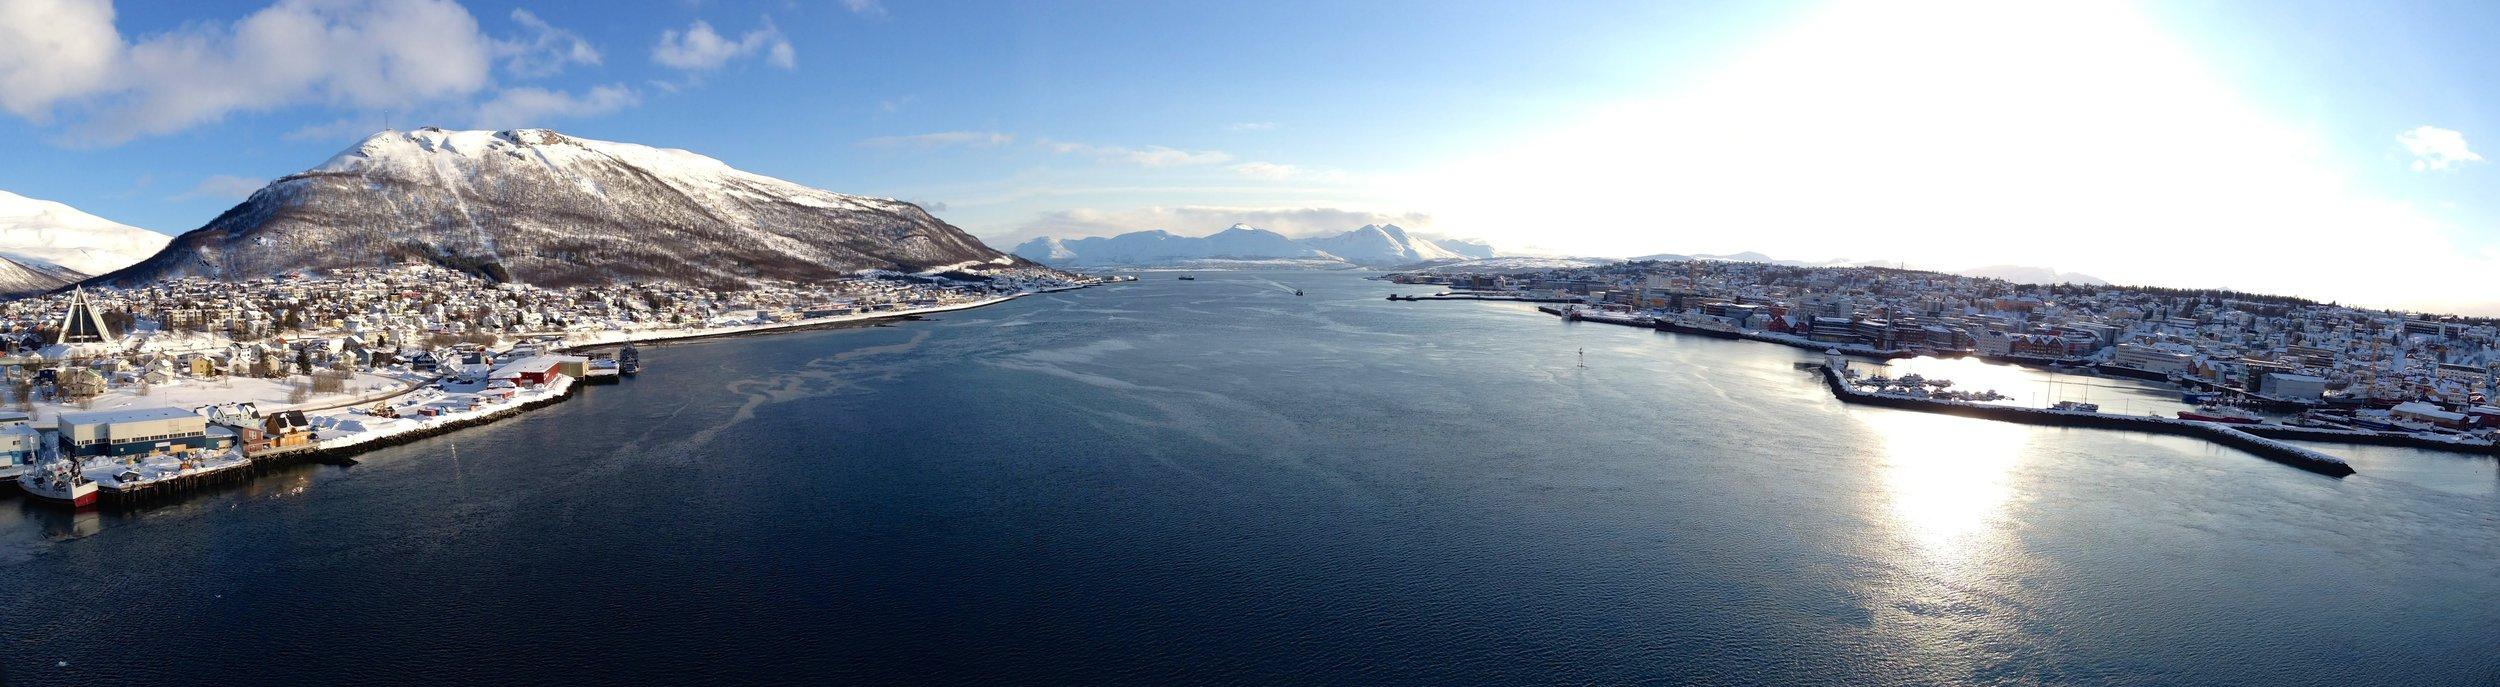 Tromso, Norway Scandinavia - Tromsøysundet strait panorama